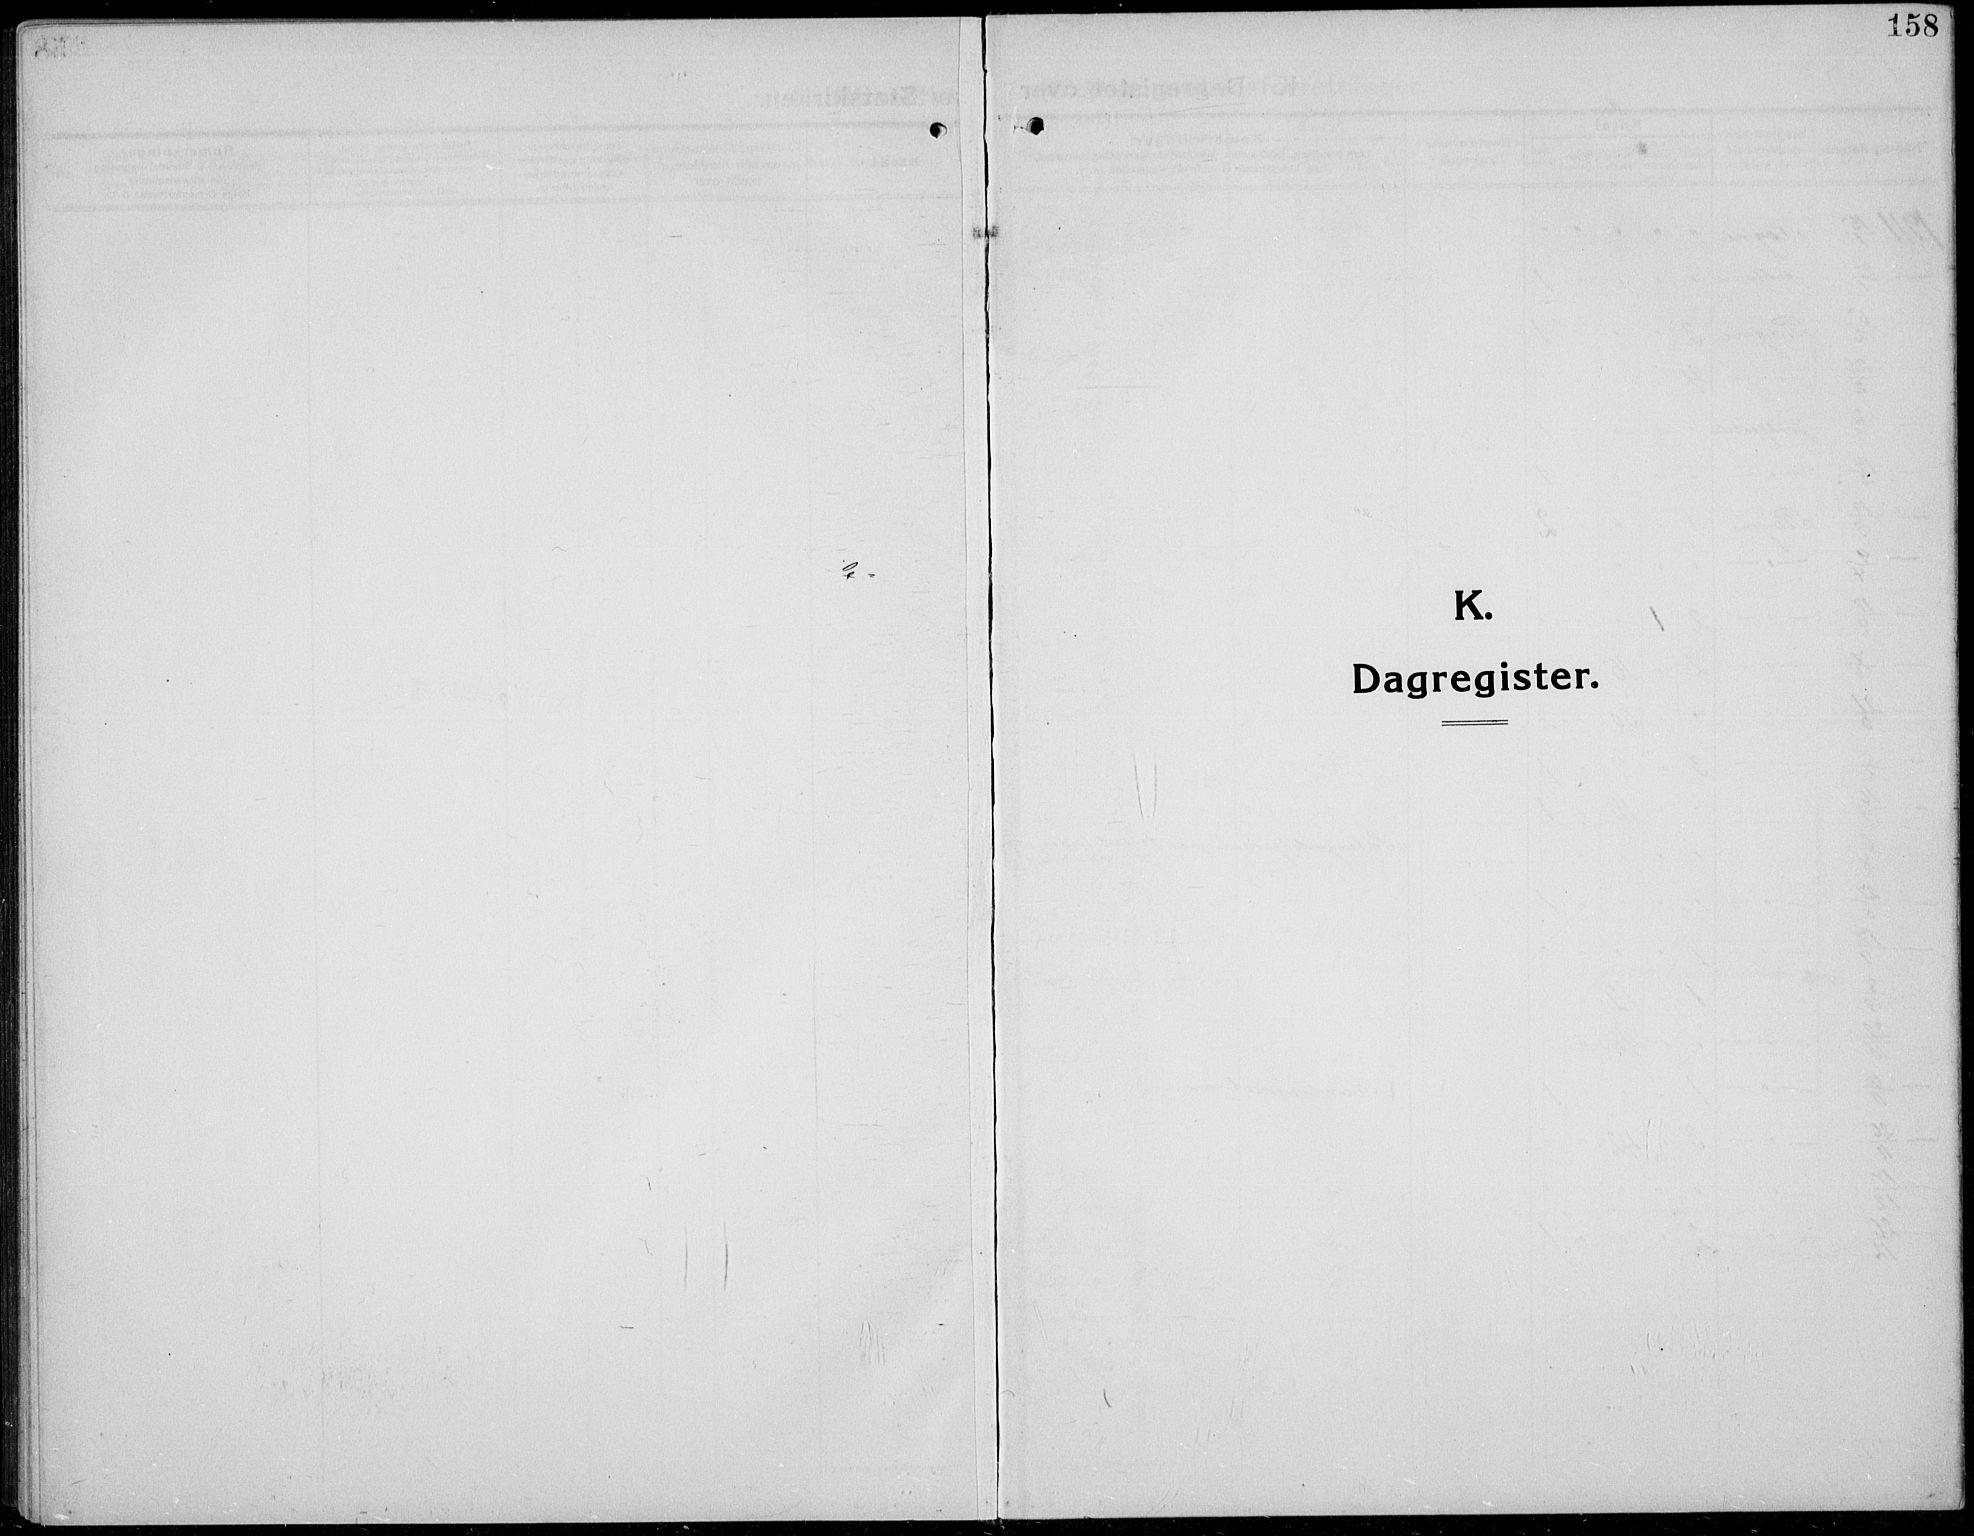 SAH, Øystre Slidre prestekontor, Klokkerbok nr. 8, 1911-1938, s. 158